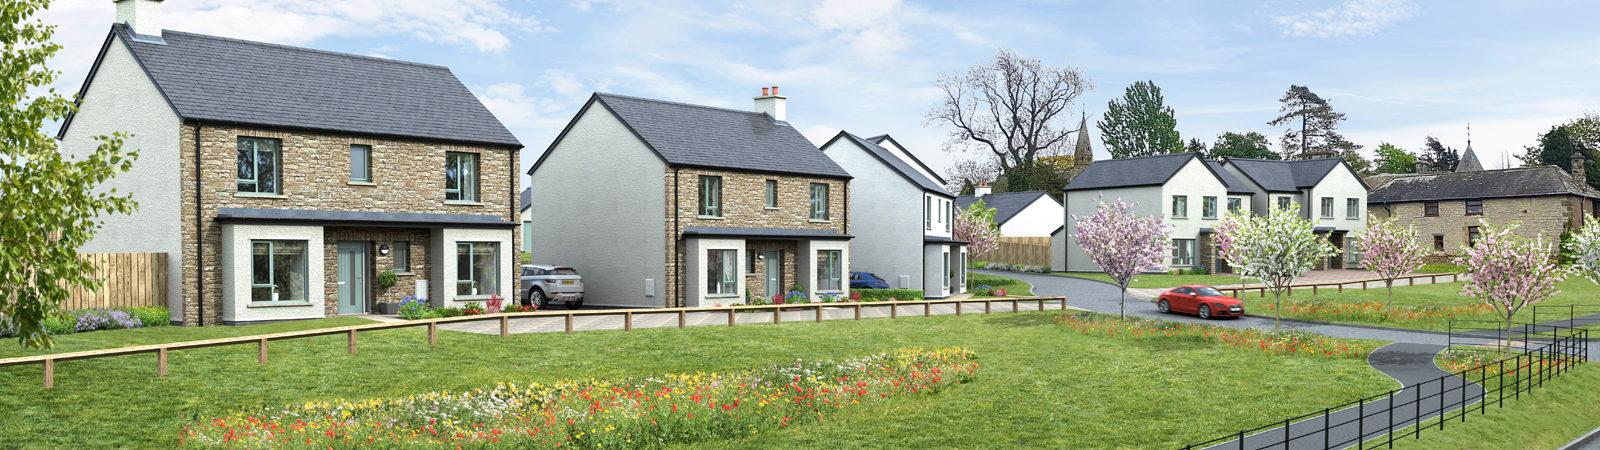 Houses for Sale in Allithwaite